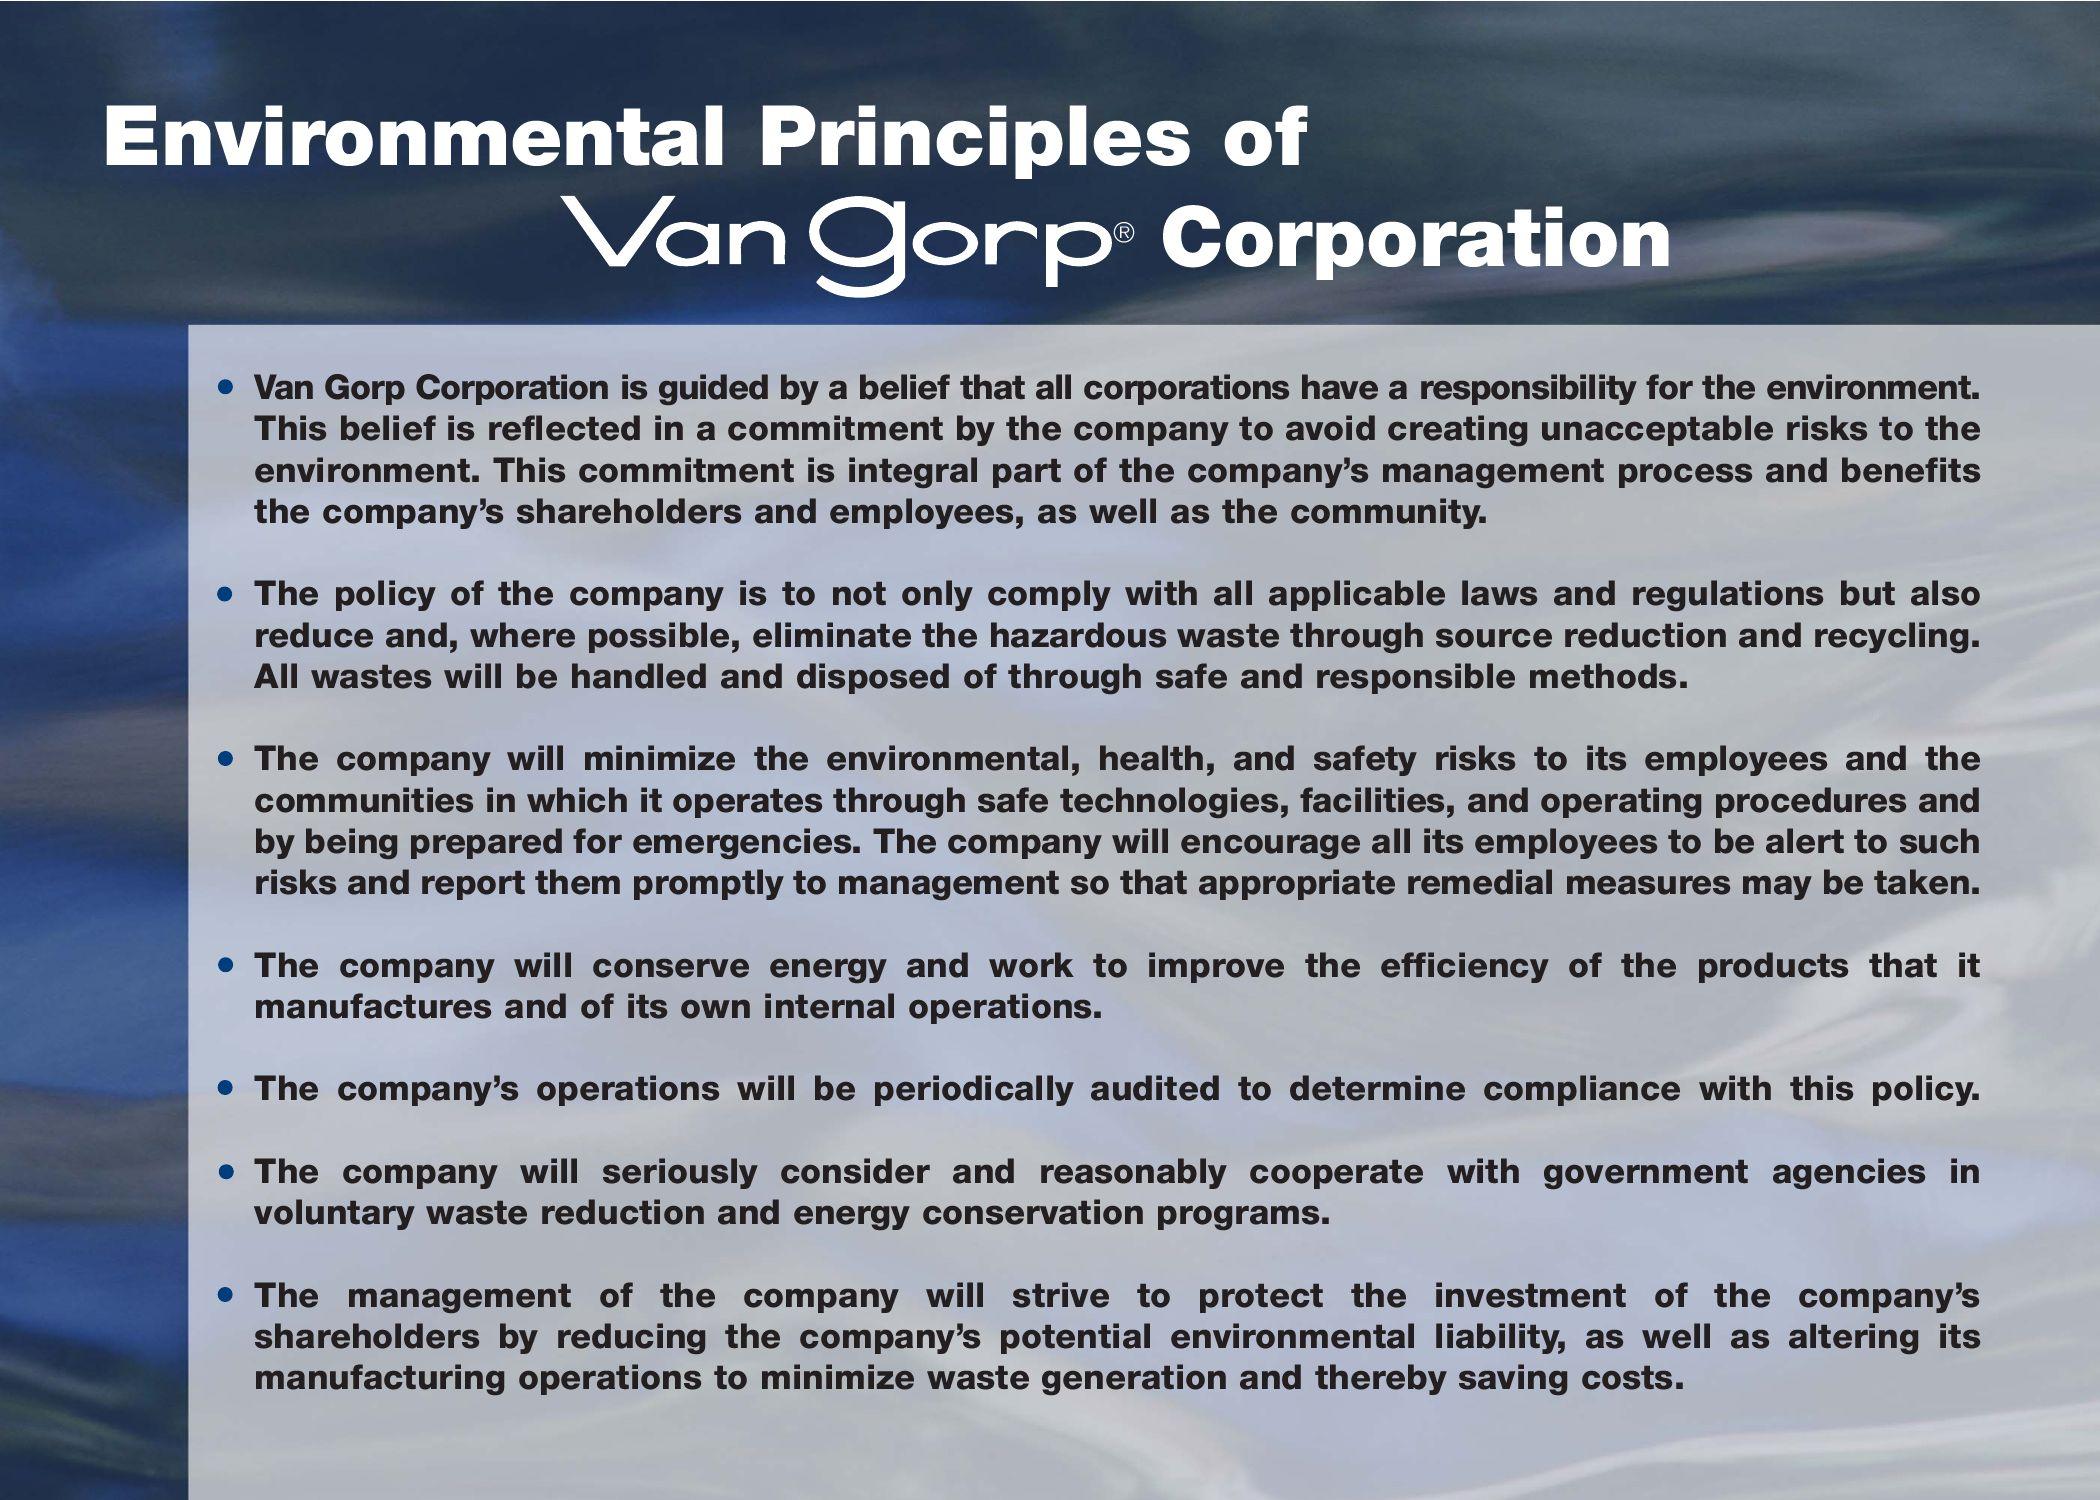 Van Gorp Environmental Principles by joe canfield - issuu